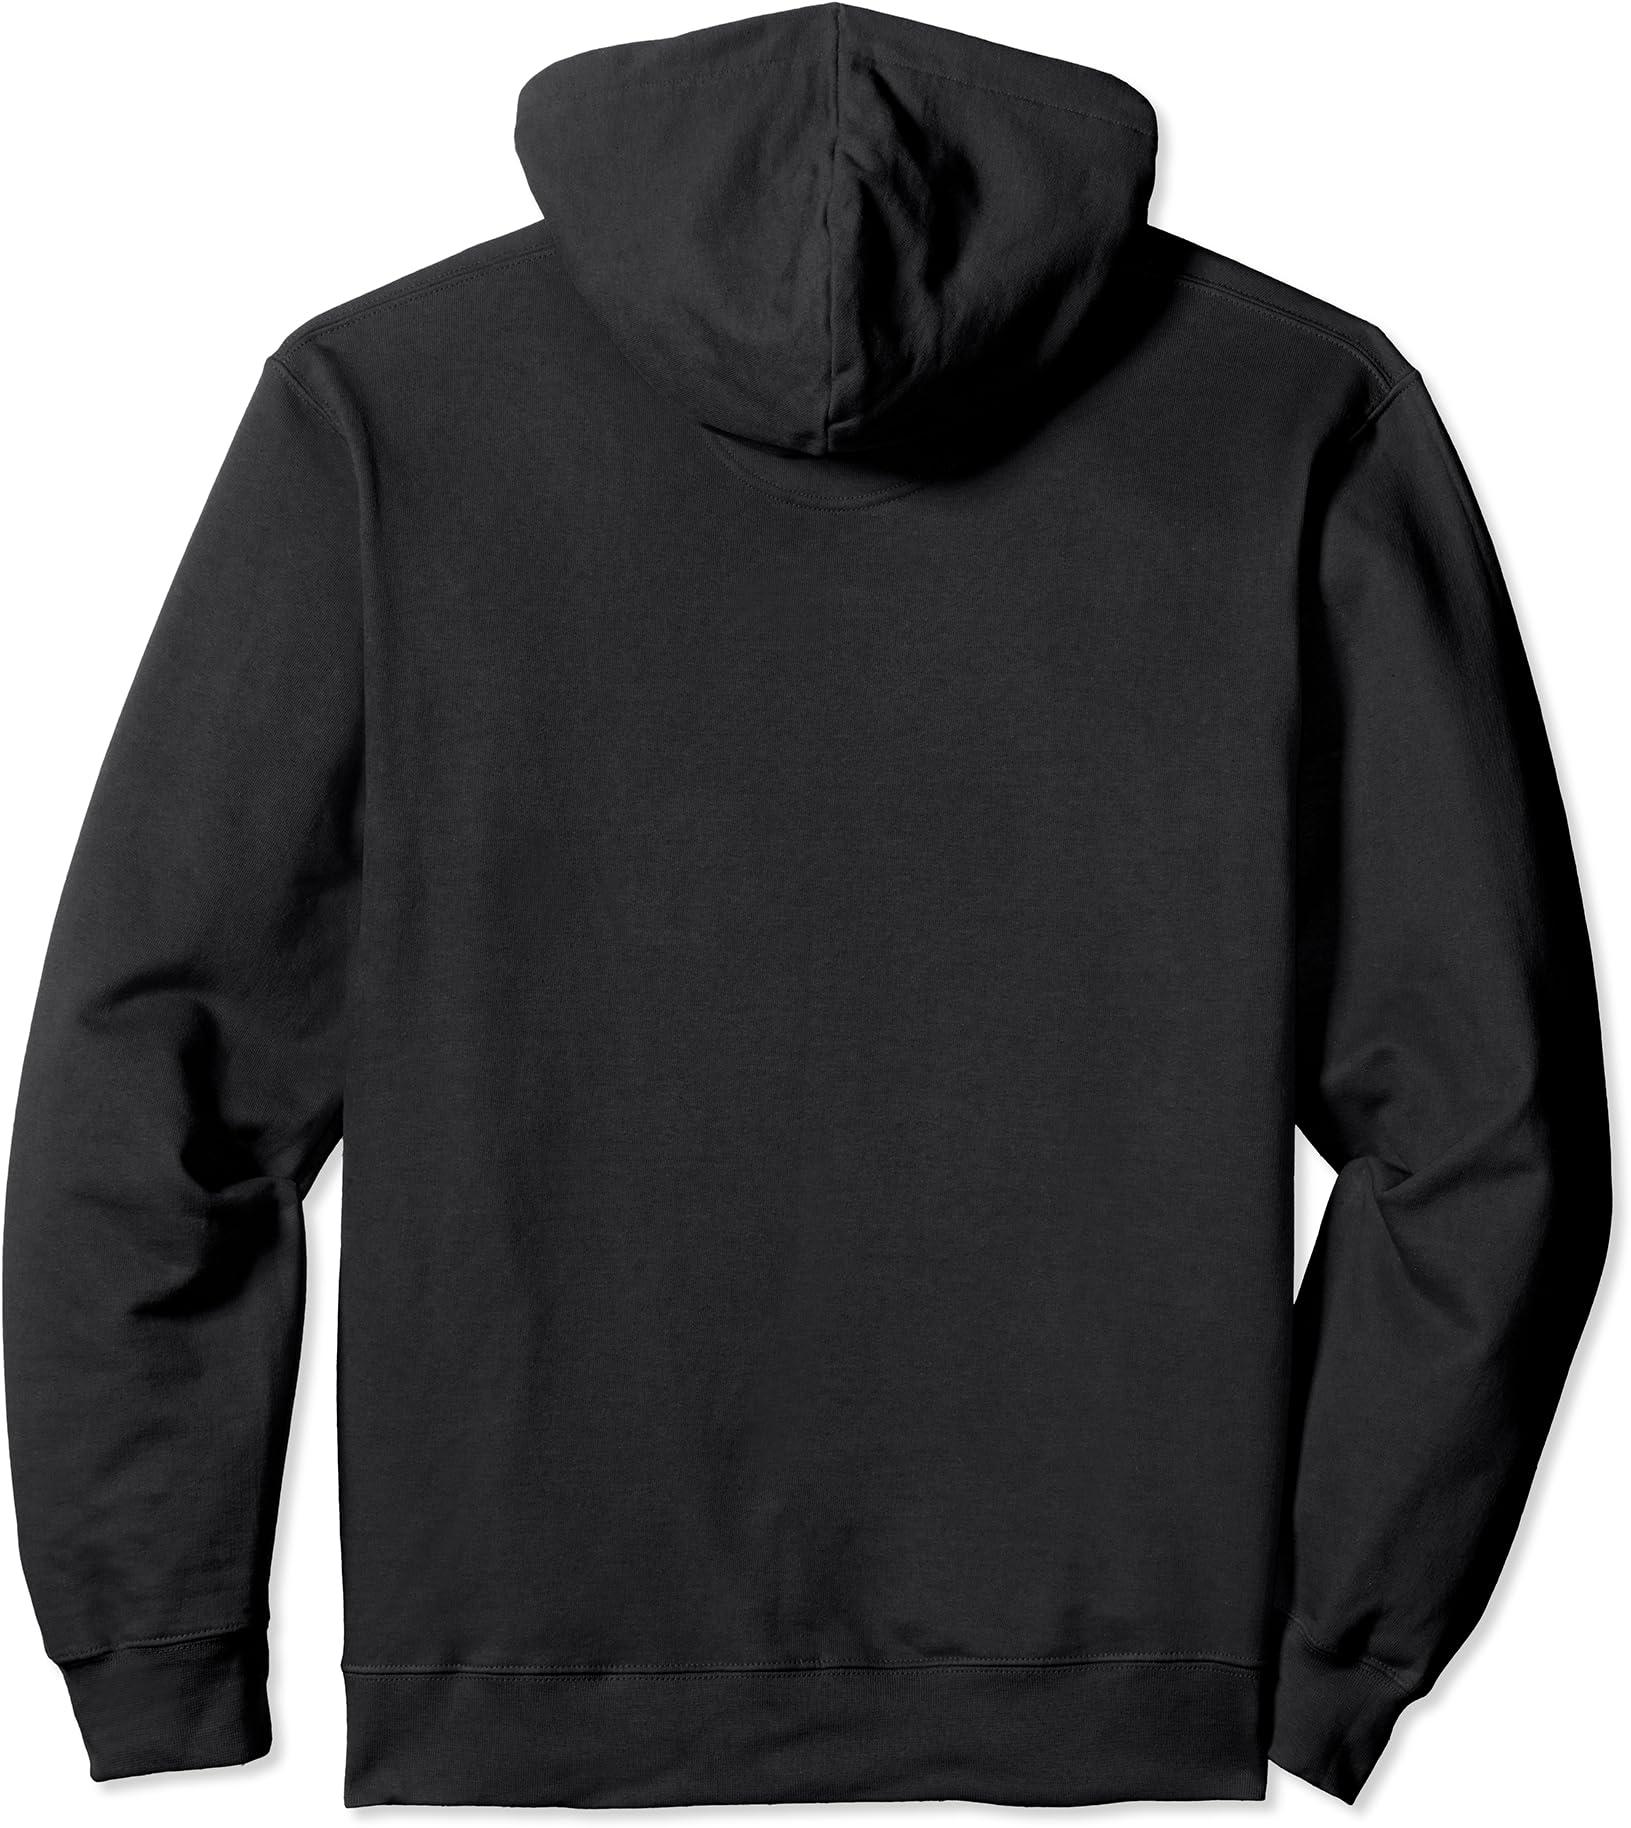 All Over Shirts Huntington Beach Pier Sweatshirt